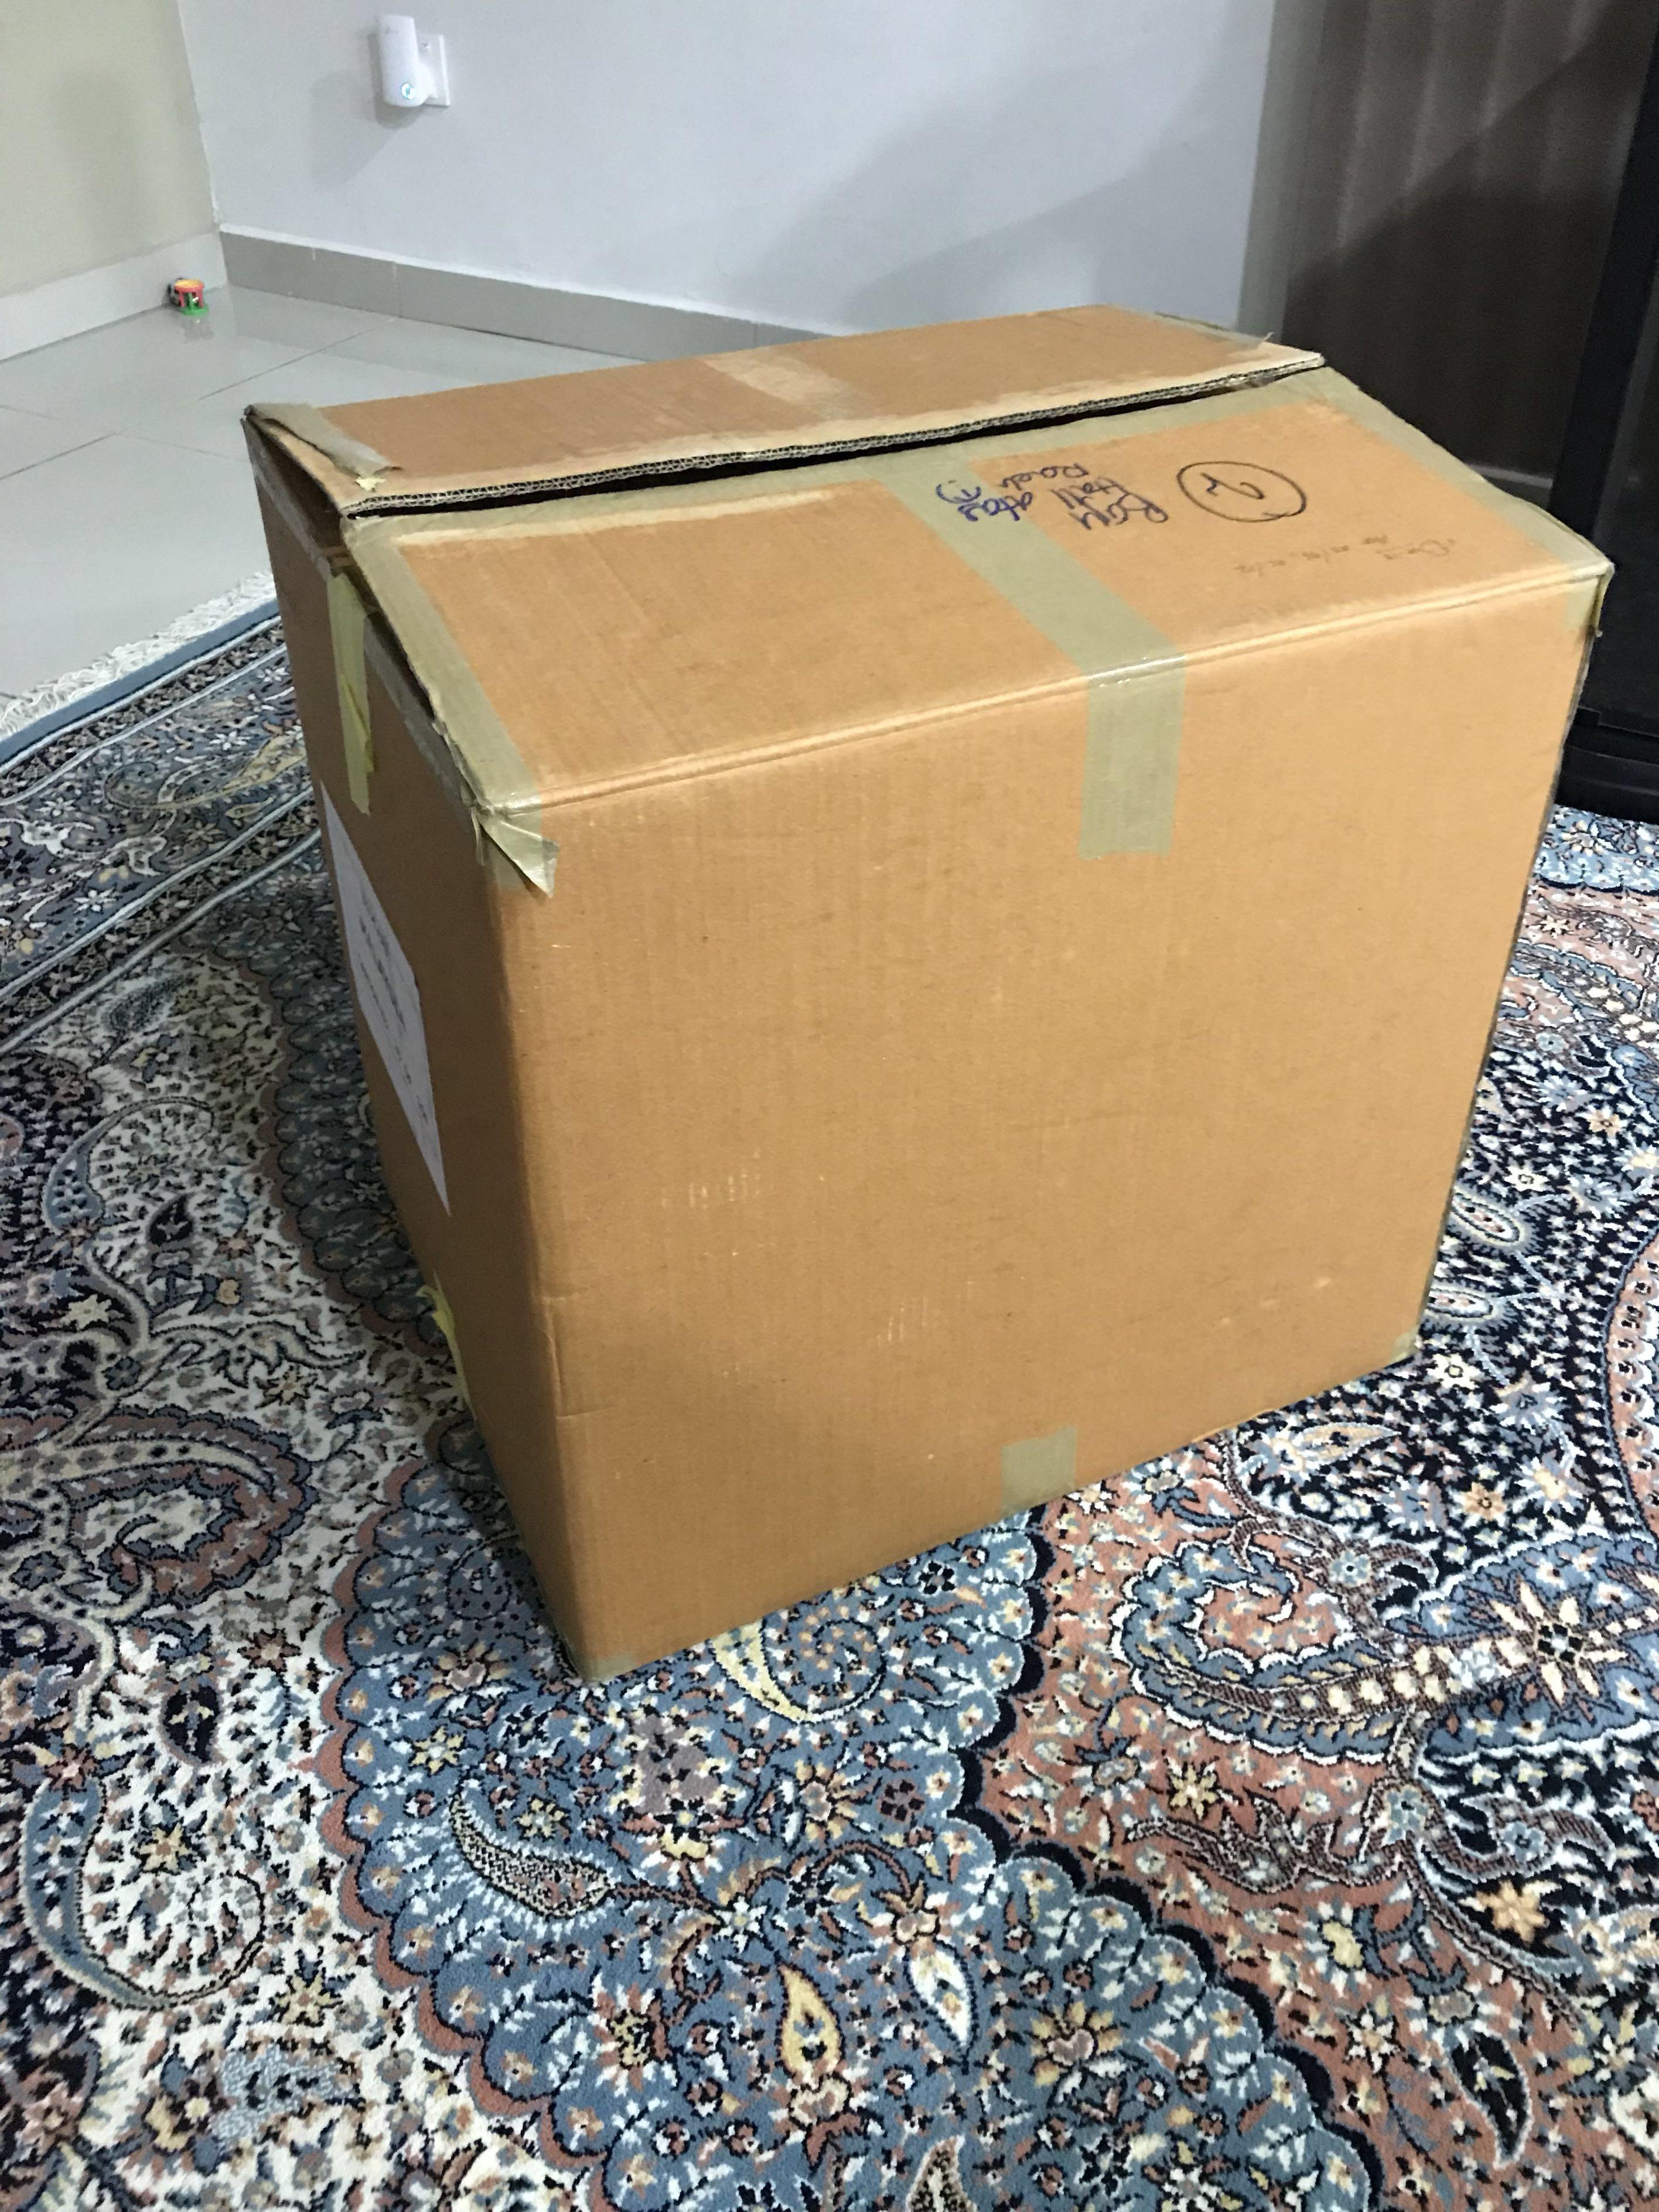 Recycle Boxes (20 units @ RM1 per unit)